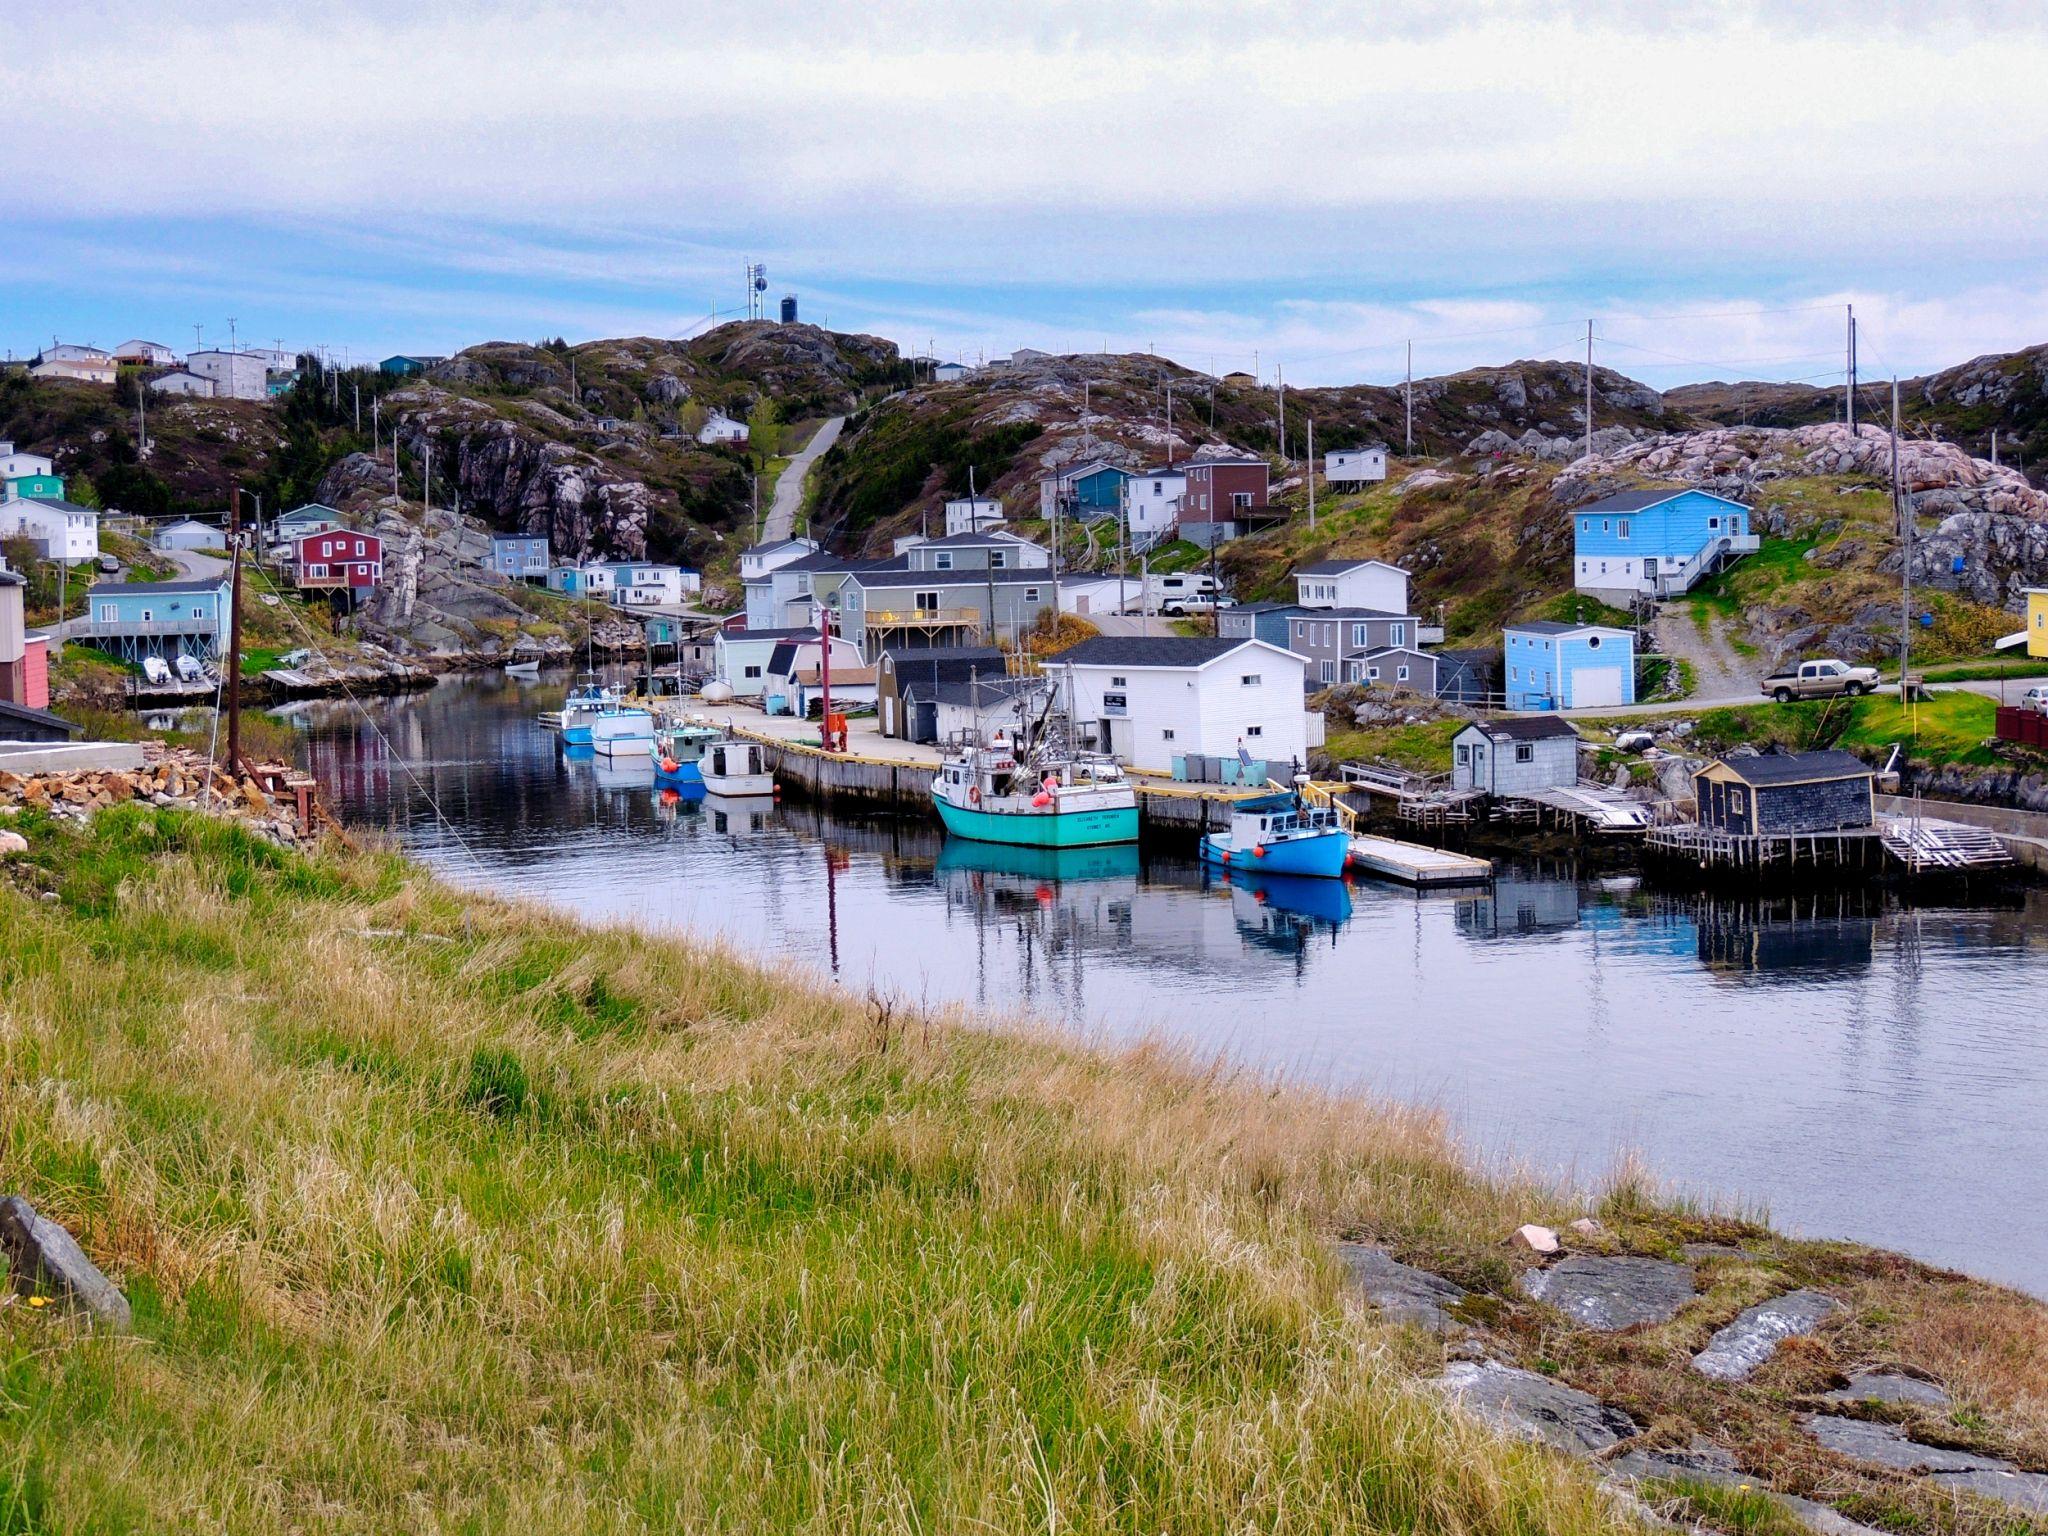 Fishing Village, Canada